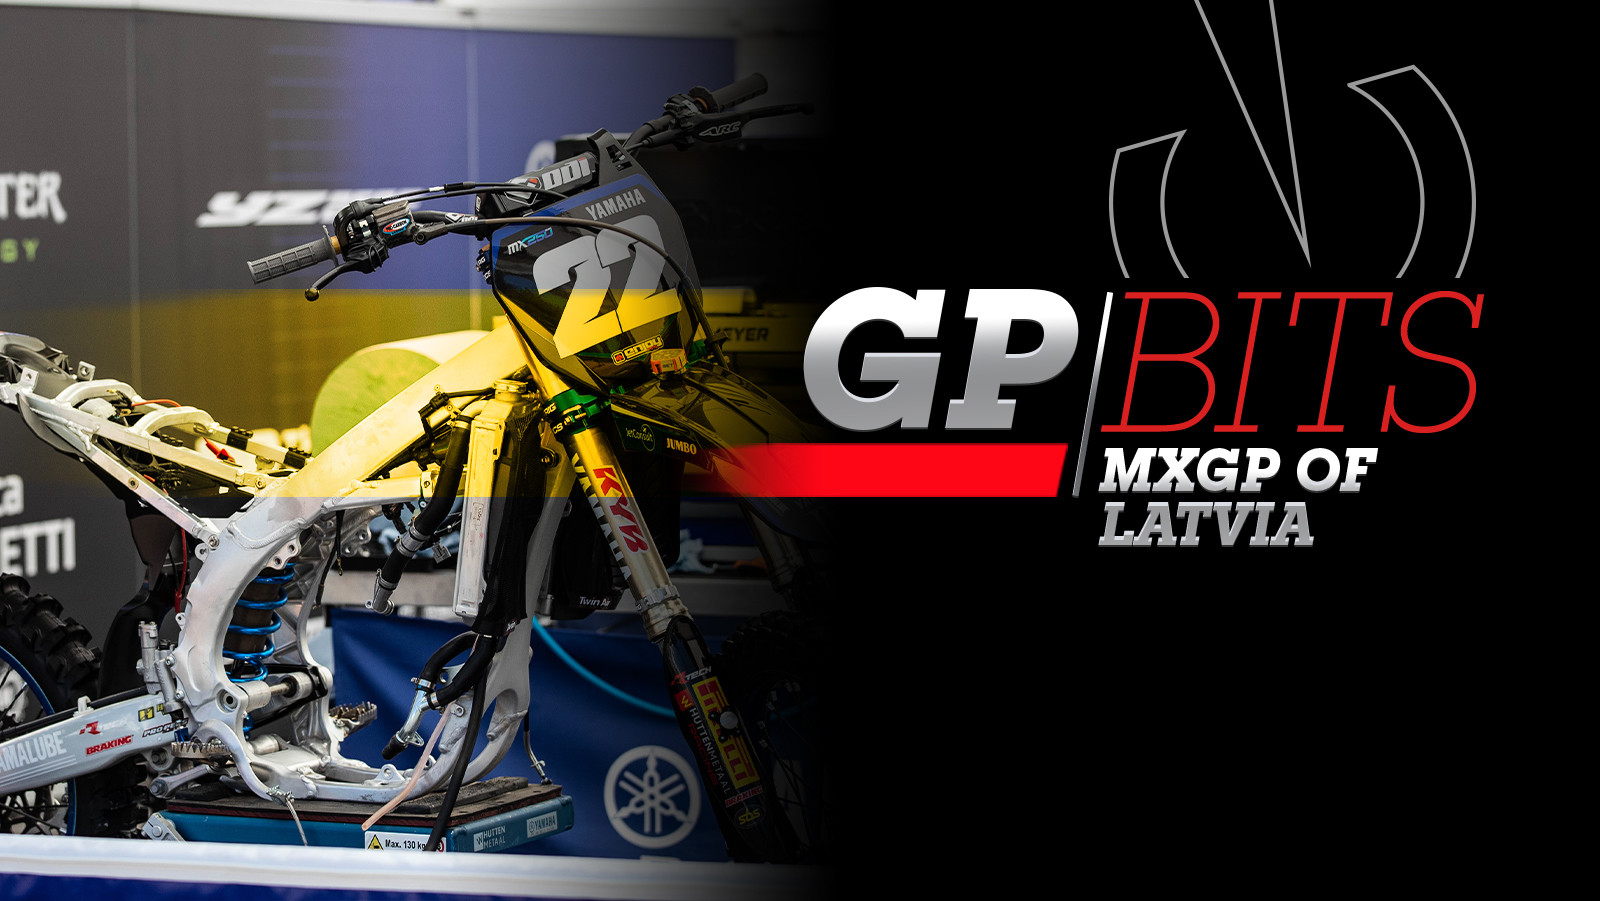 GP Bits: MXGP of Latvia   Round 3